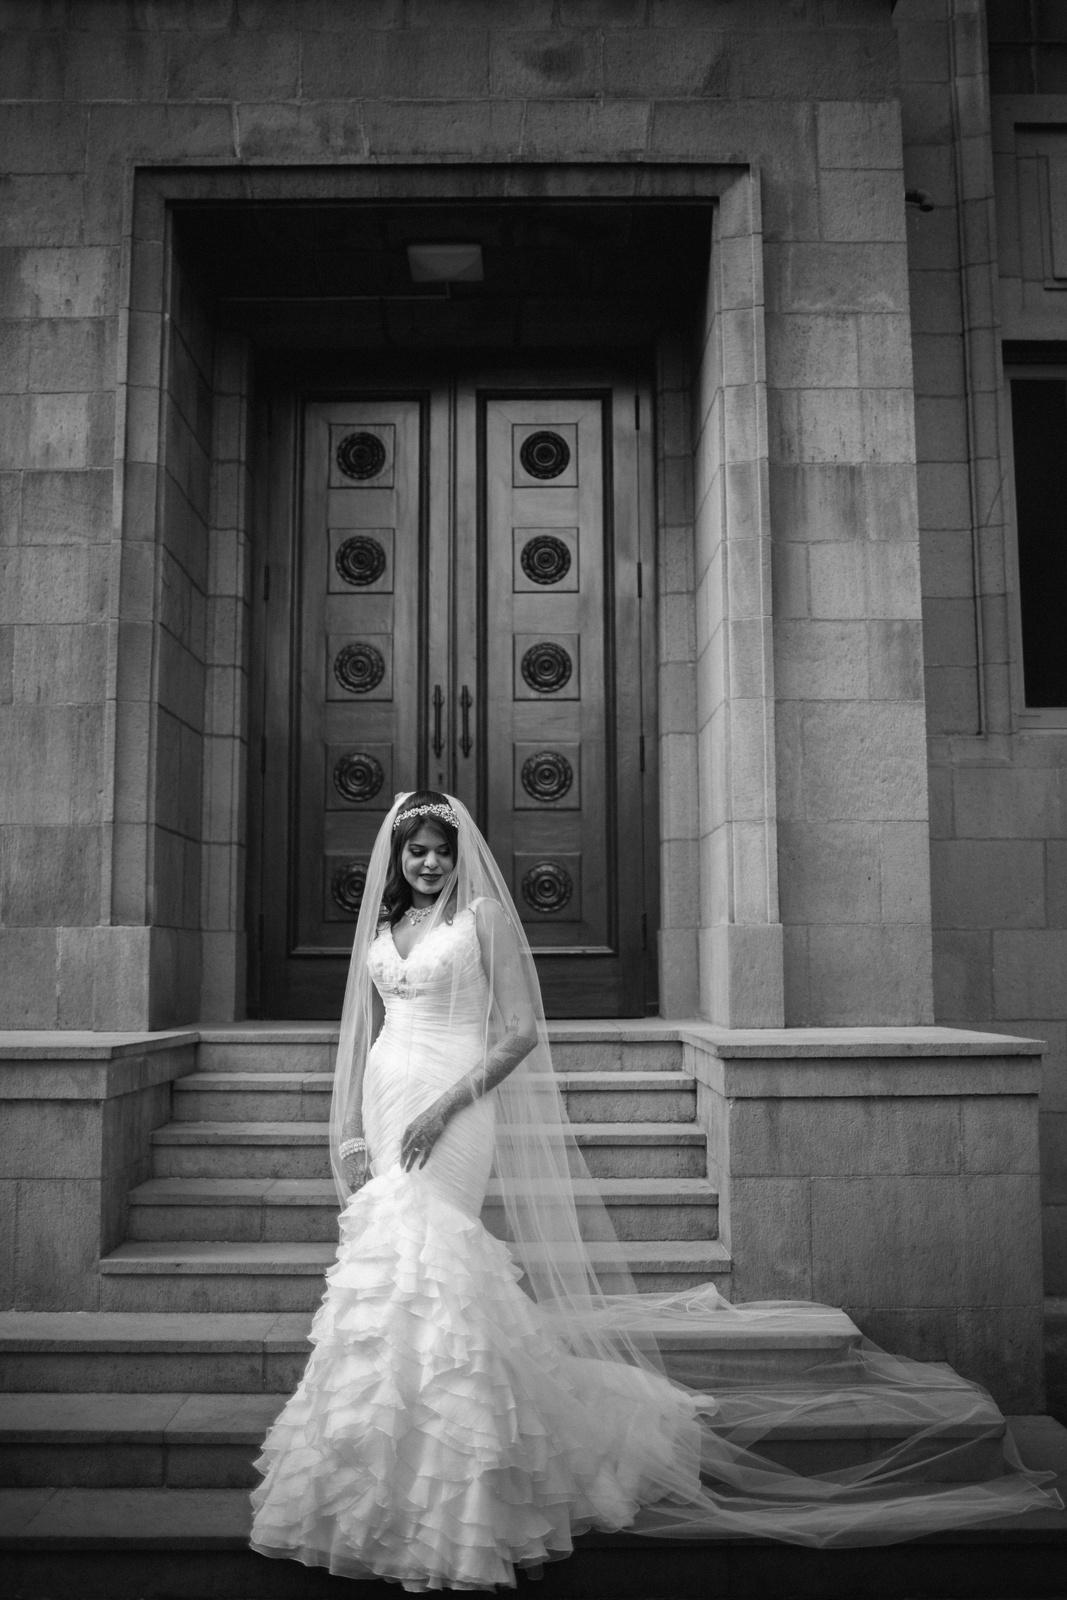 church-wedding-mumbai-into-candid-photography-3912.jpg